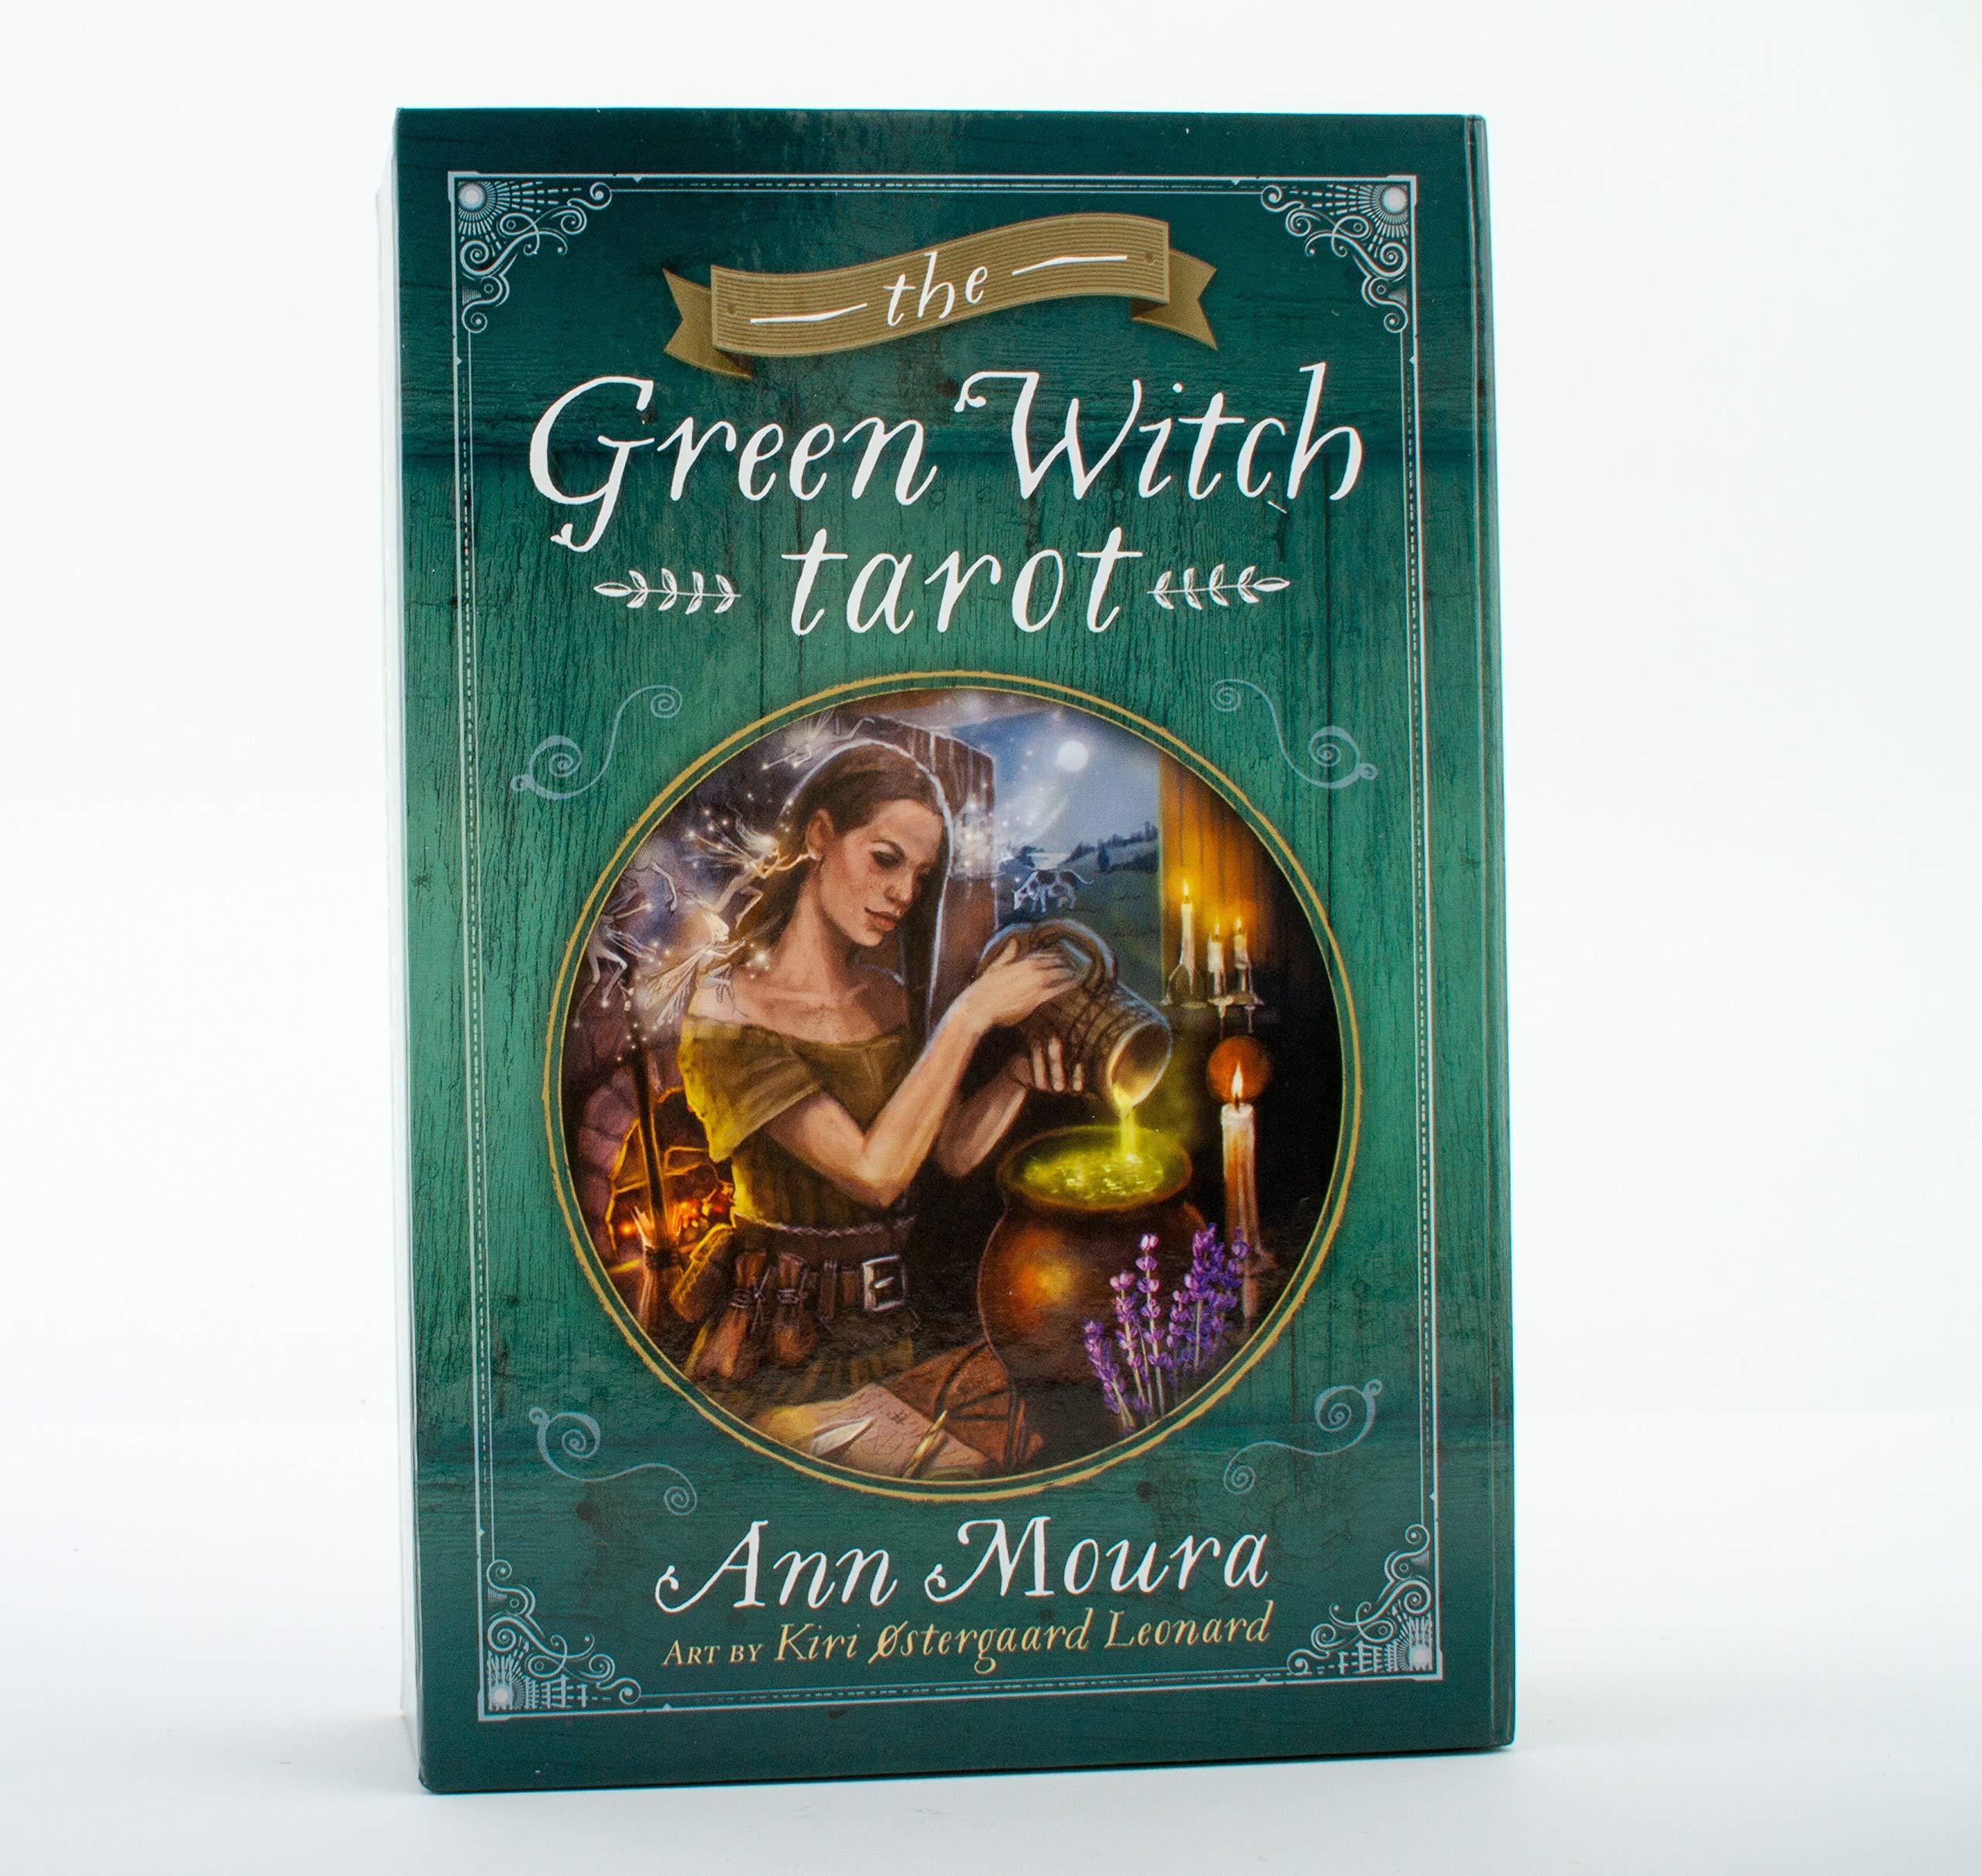 The Green Witch Tarot (Green Witchcraft Series, 8): Ann Moura, Kiri  Leonard: 9780738741659: Amazon.com: Books